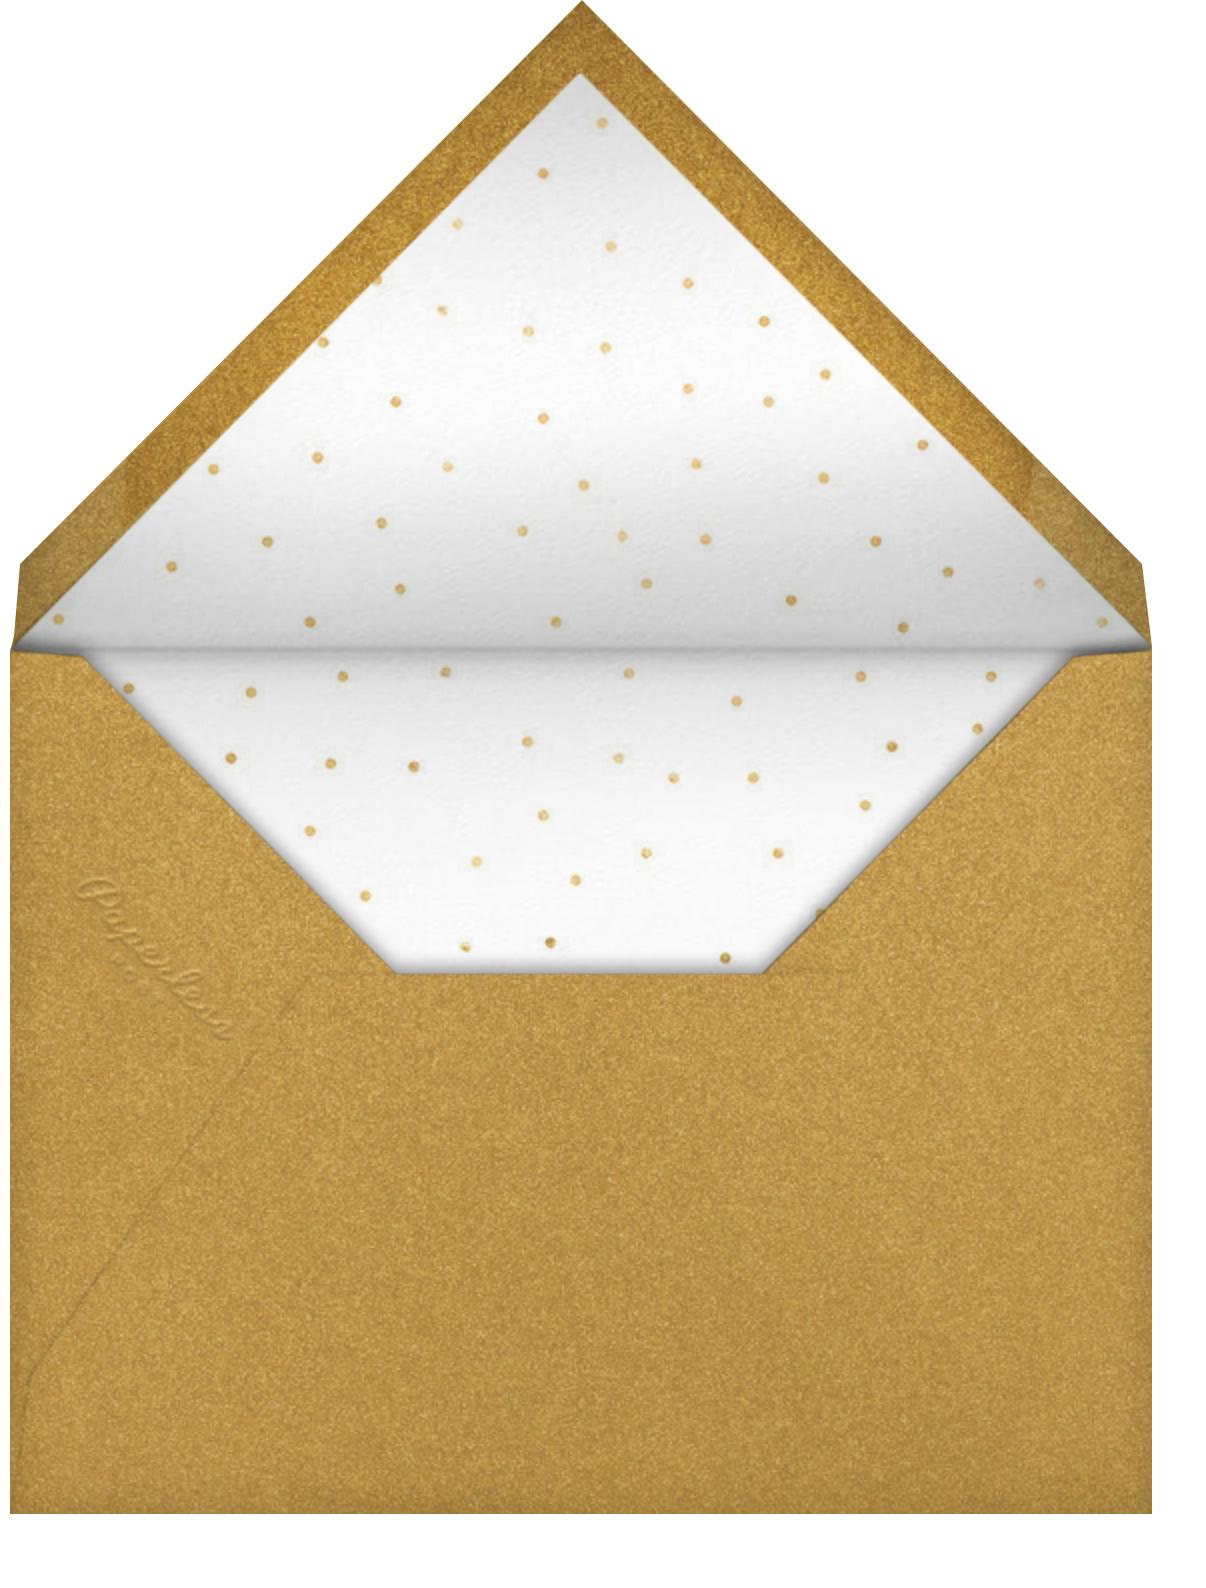 It's Going Down - Paperless Post - Bridal shower - envelope back